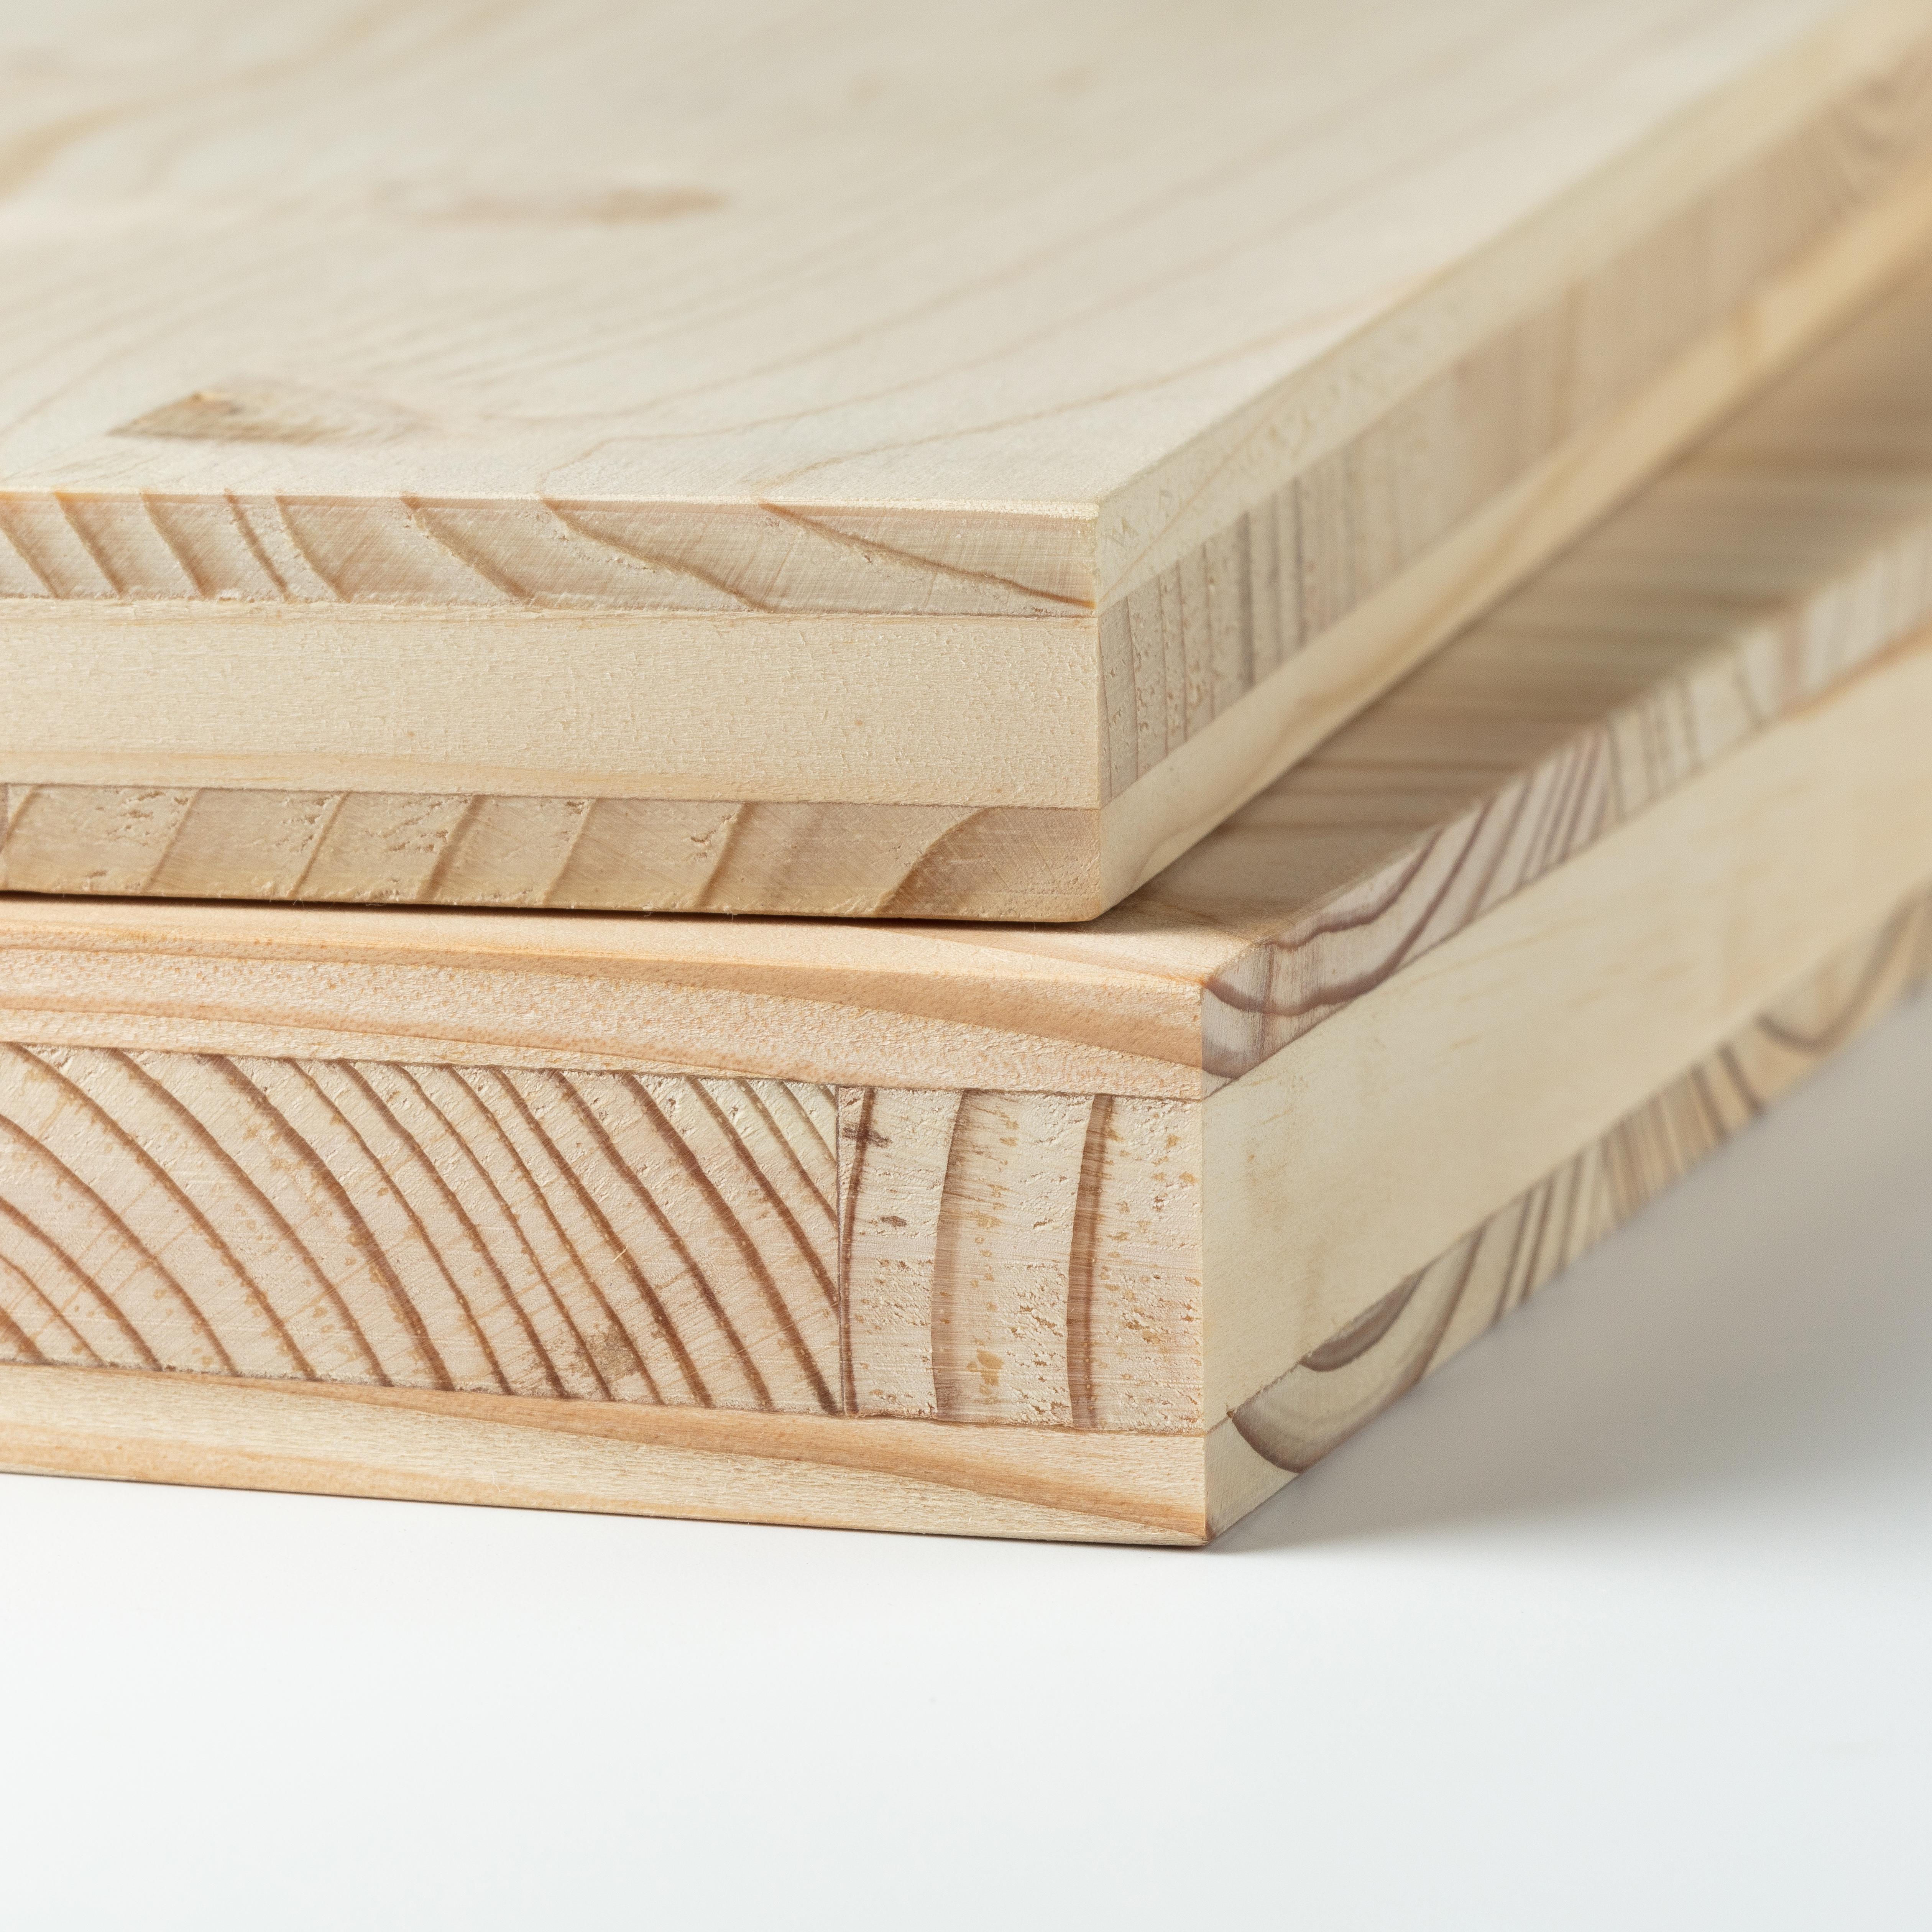 panneau-bois-massif-3-plis